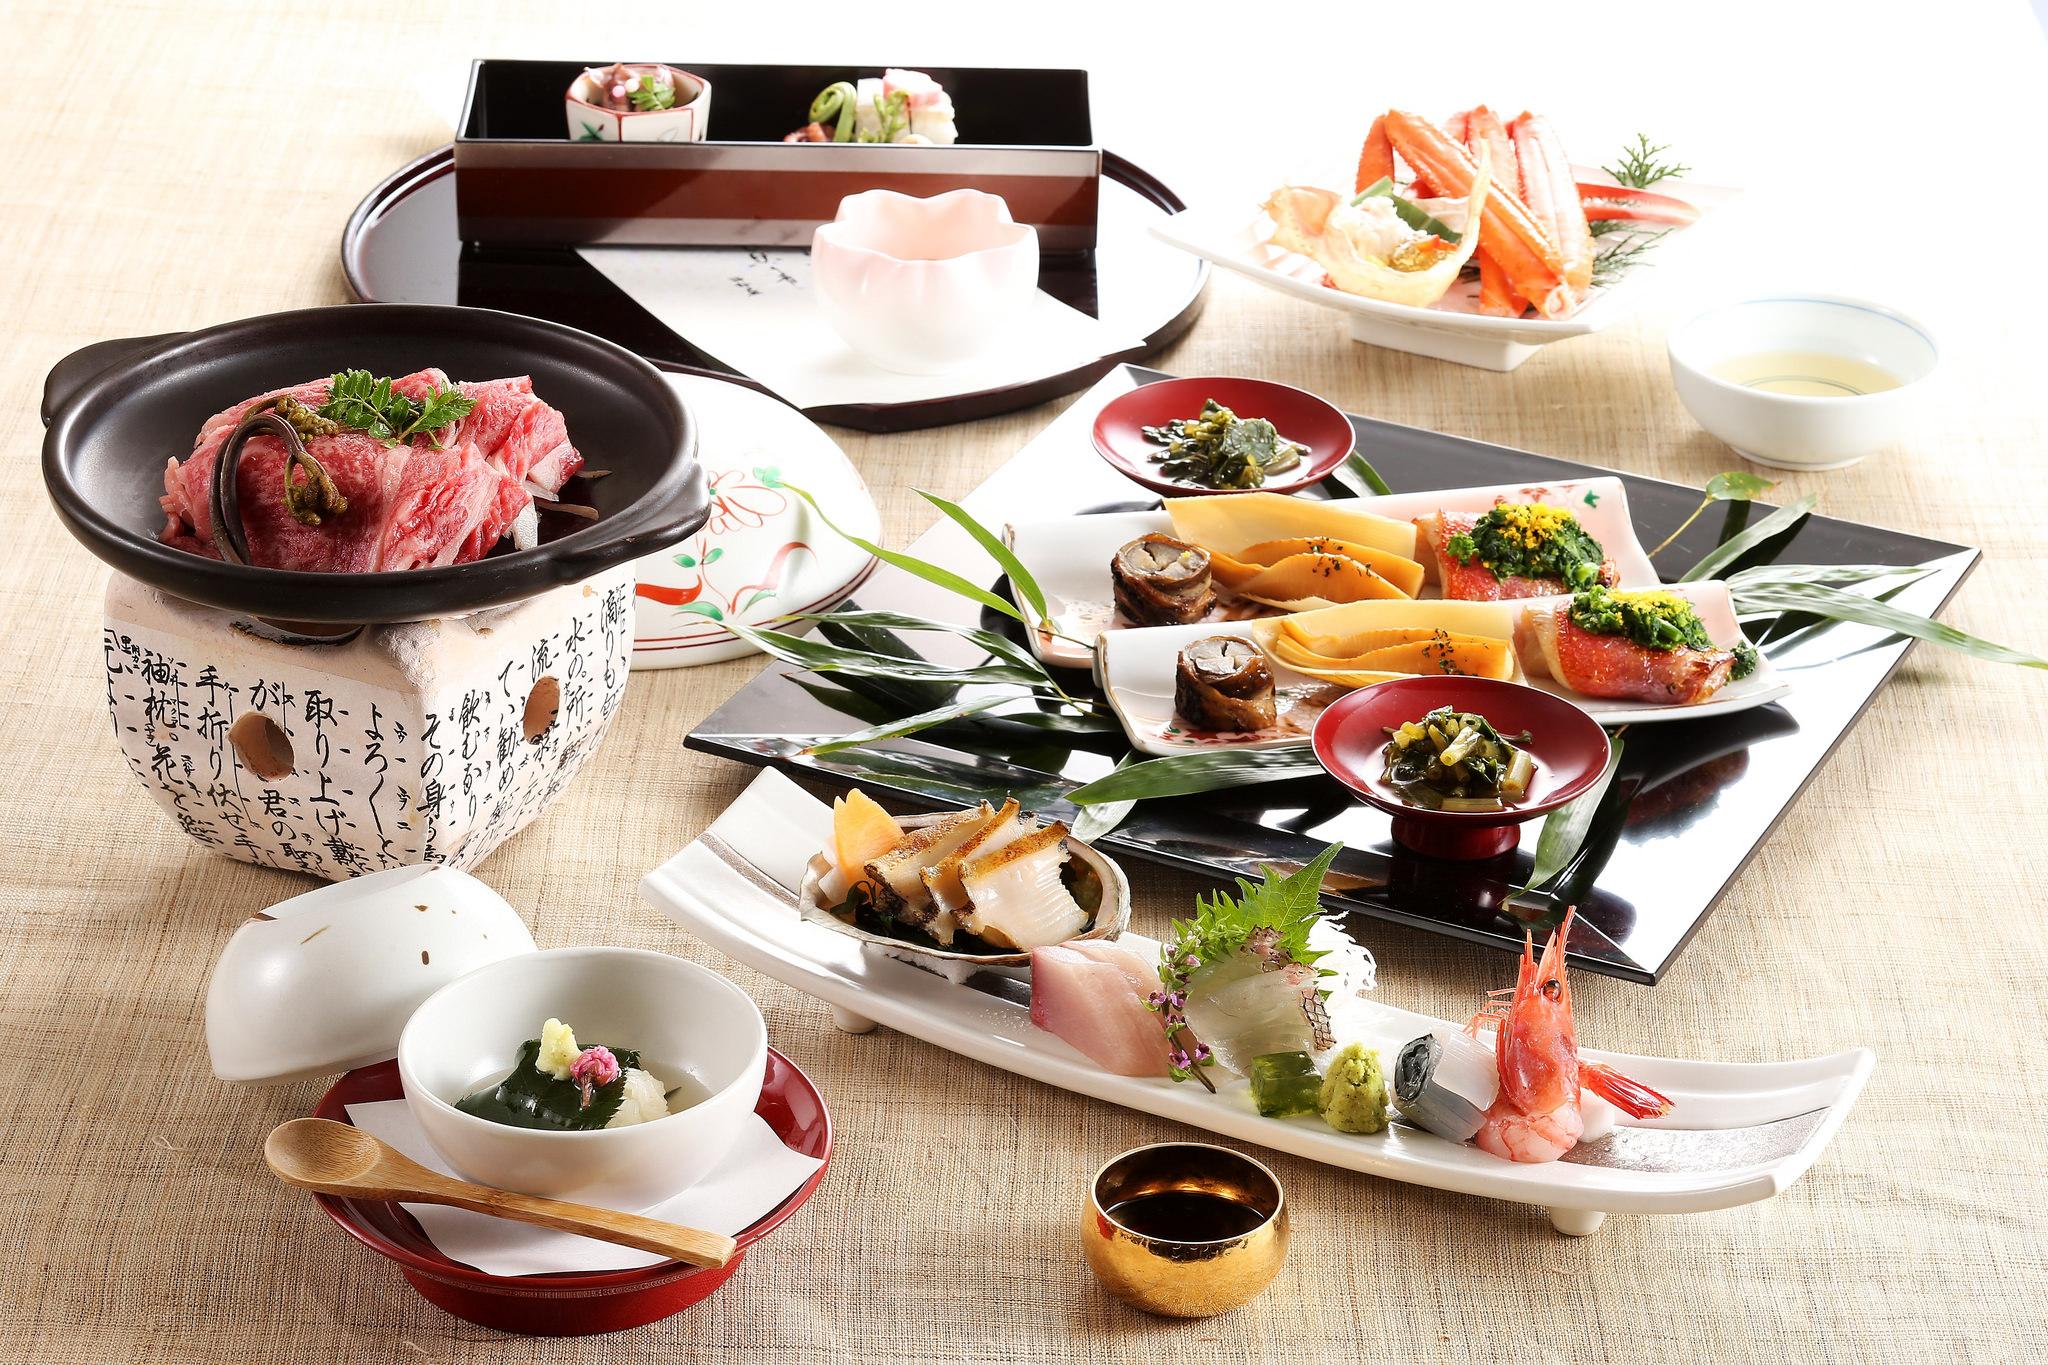 Kaiseki Dining at Nishimuraya Hotel Shogetsutei